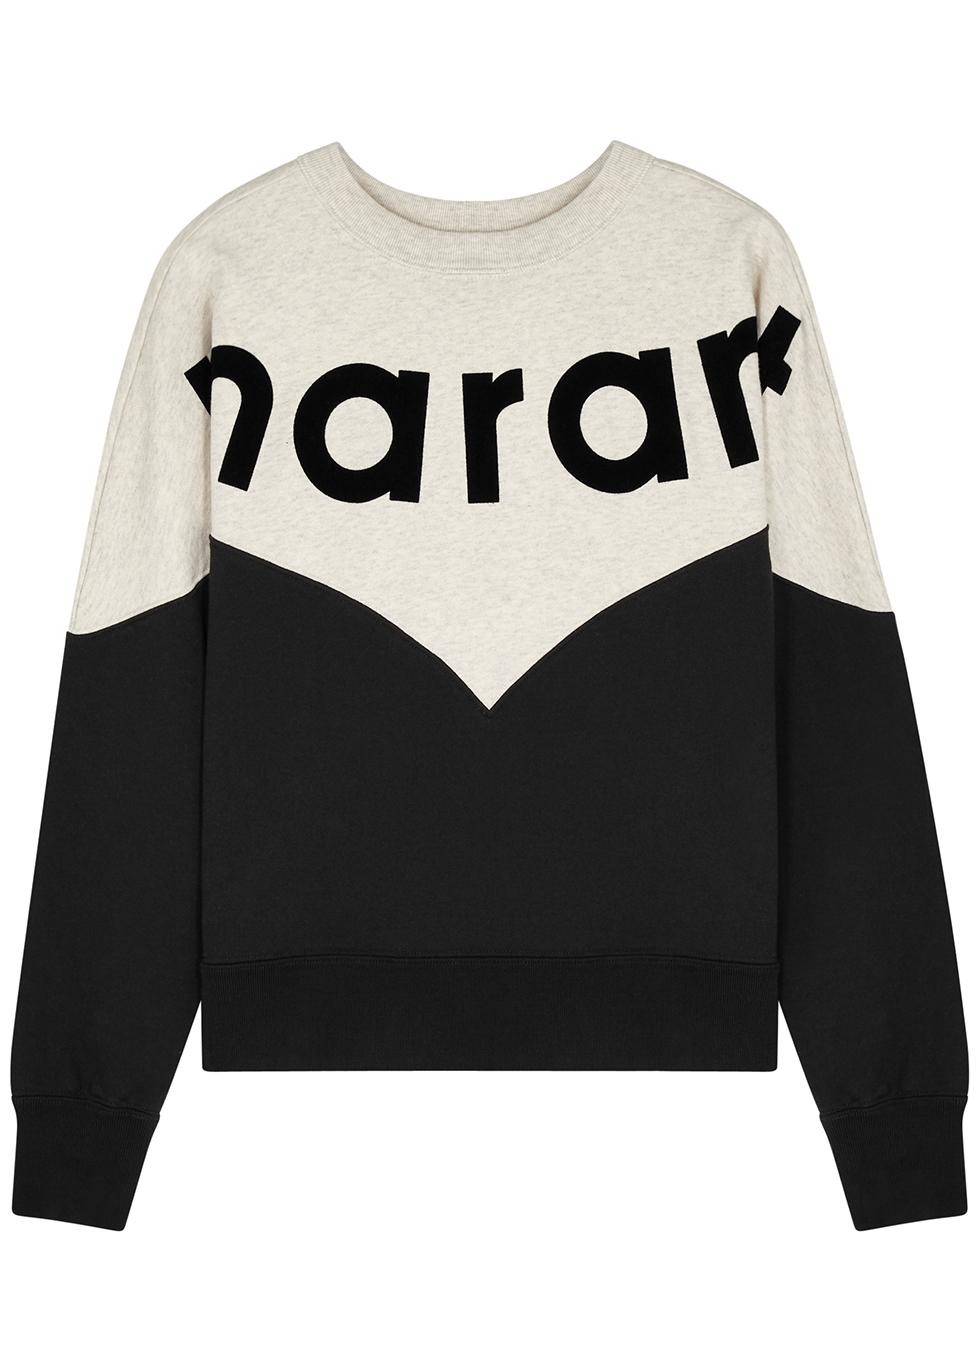 Houston logo cotton-blend sweatshirt